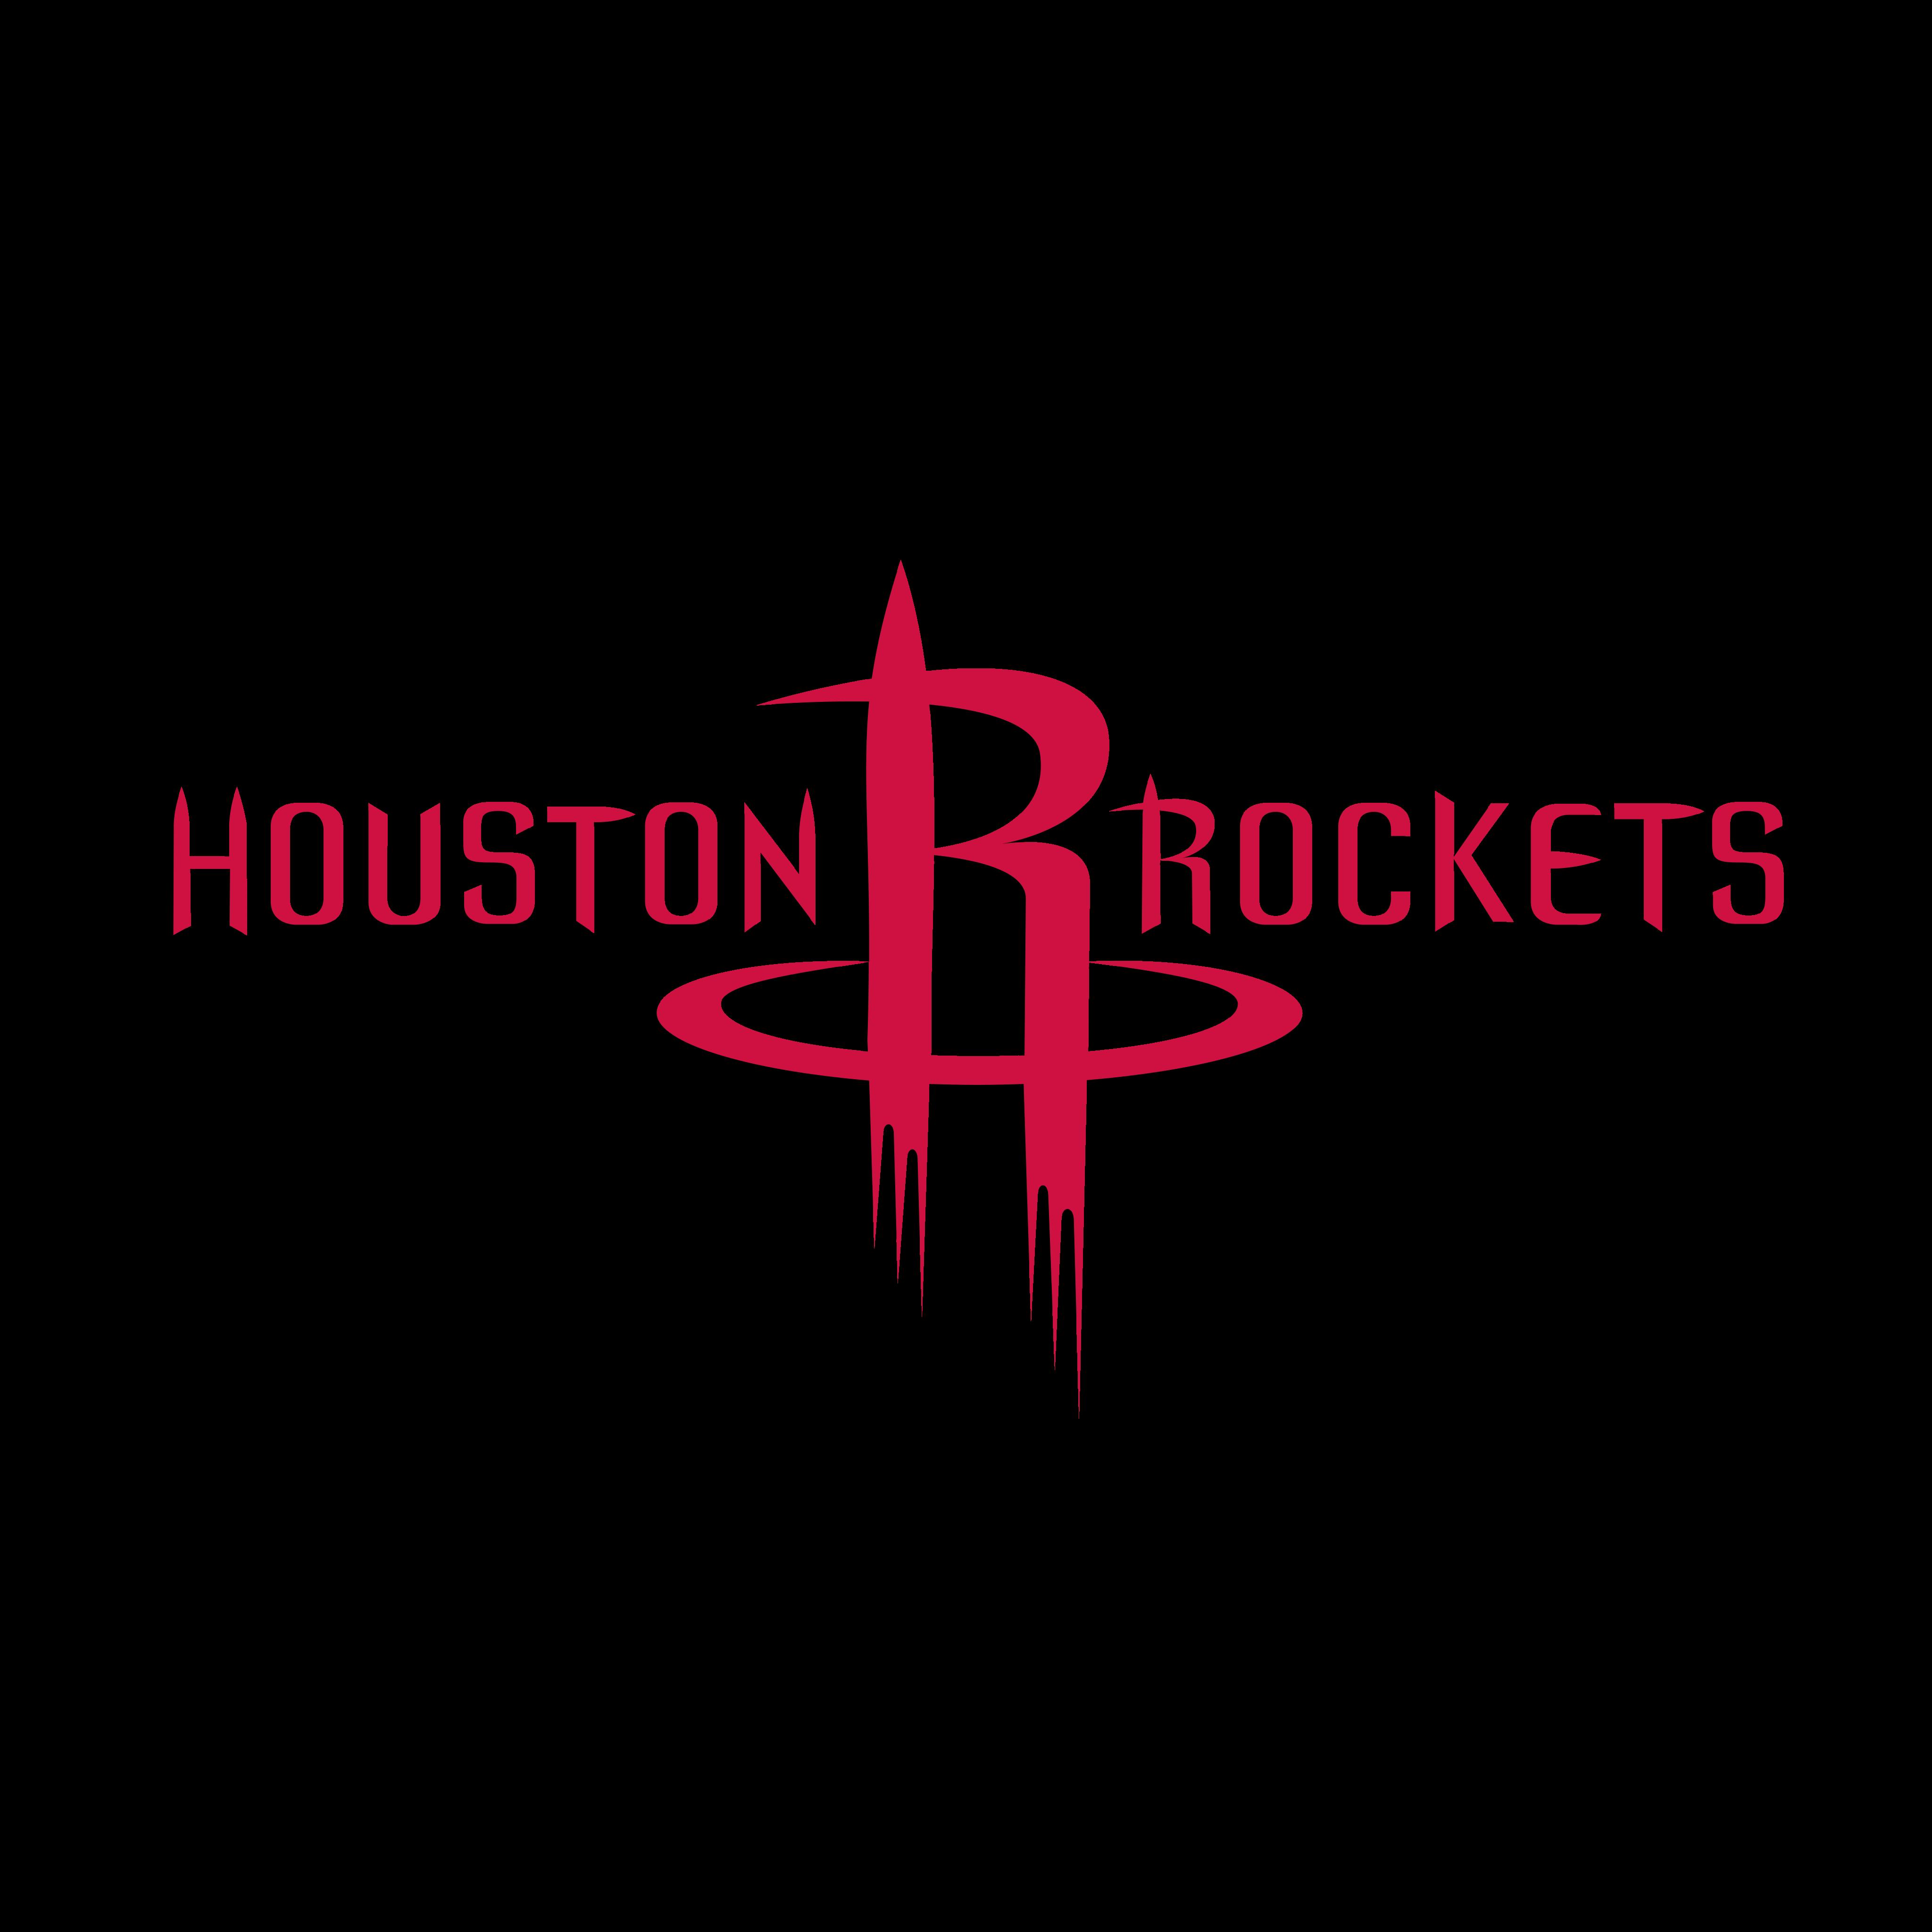 houston-rockets-logo-0